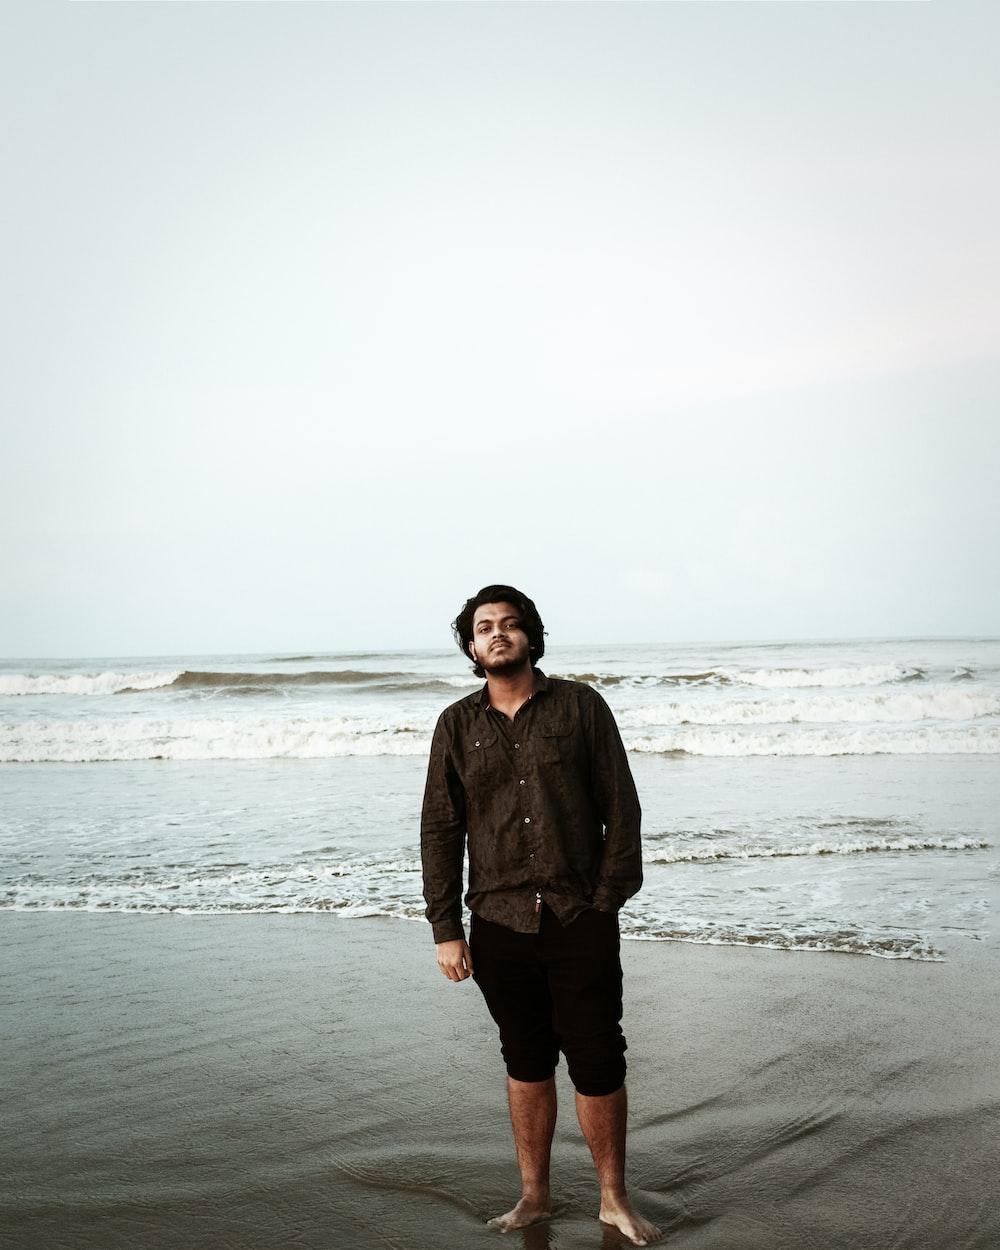 man in black jacket standing on beach